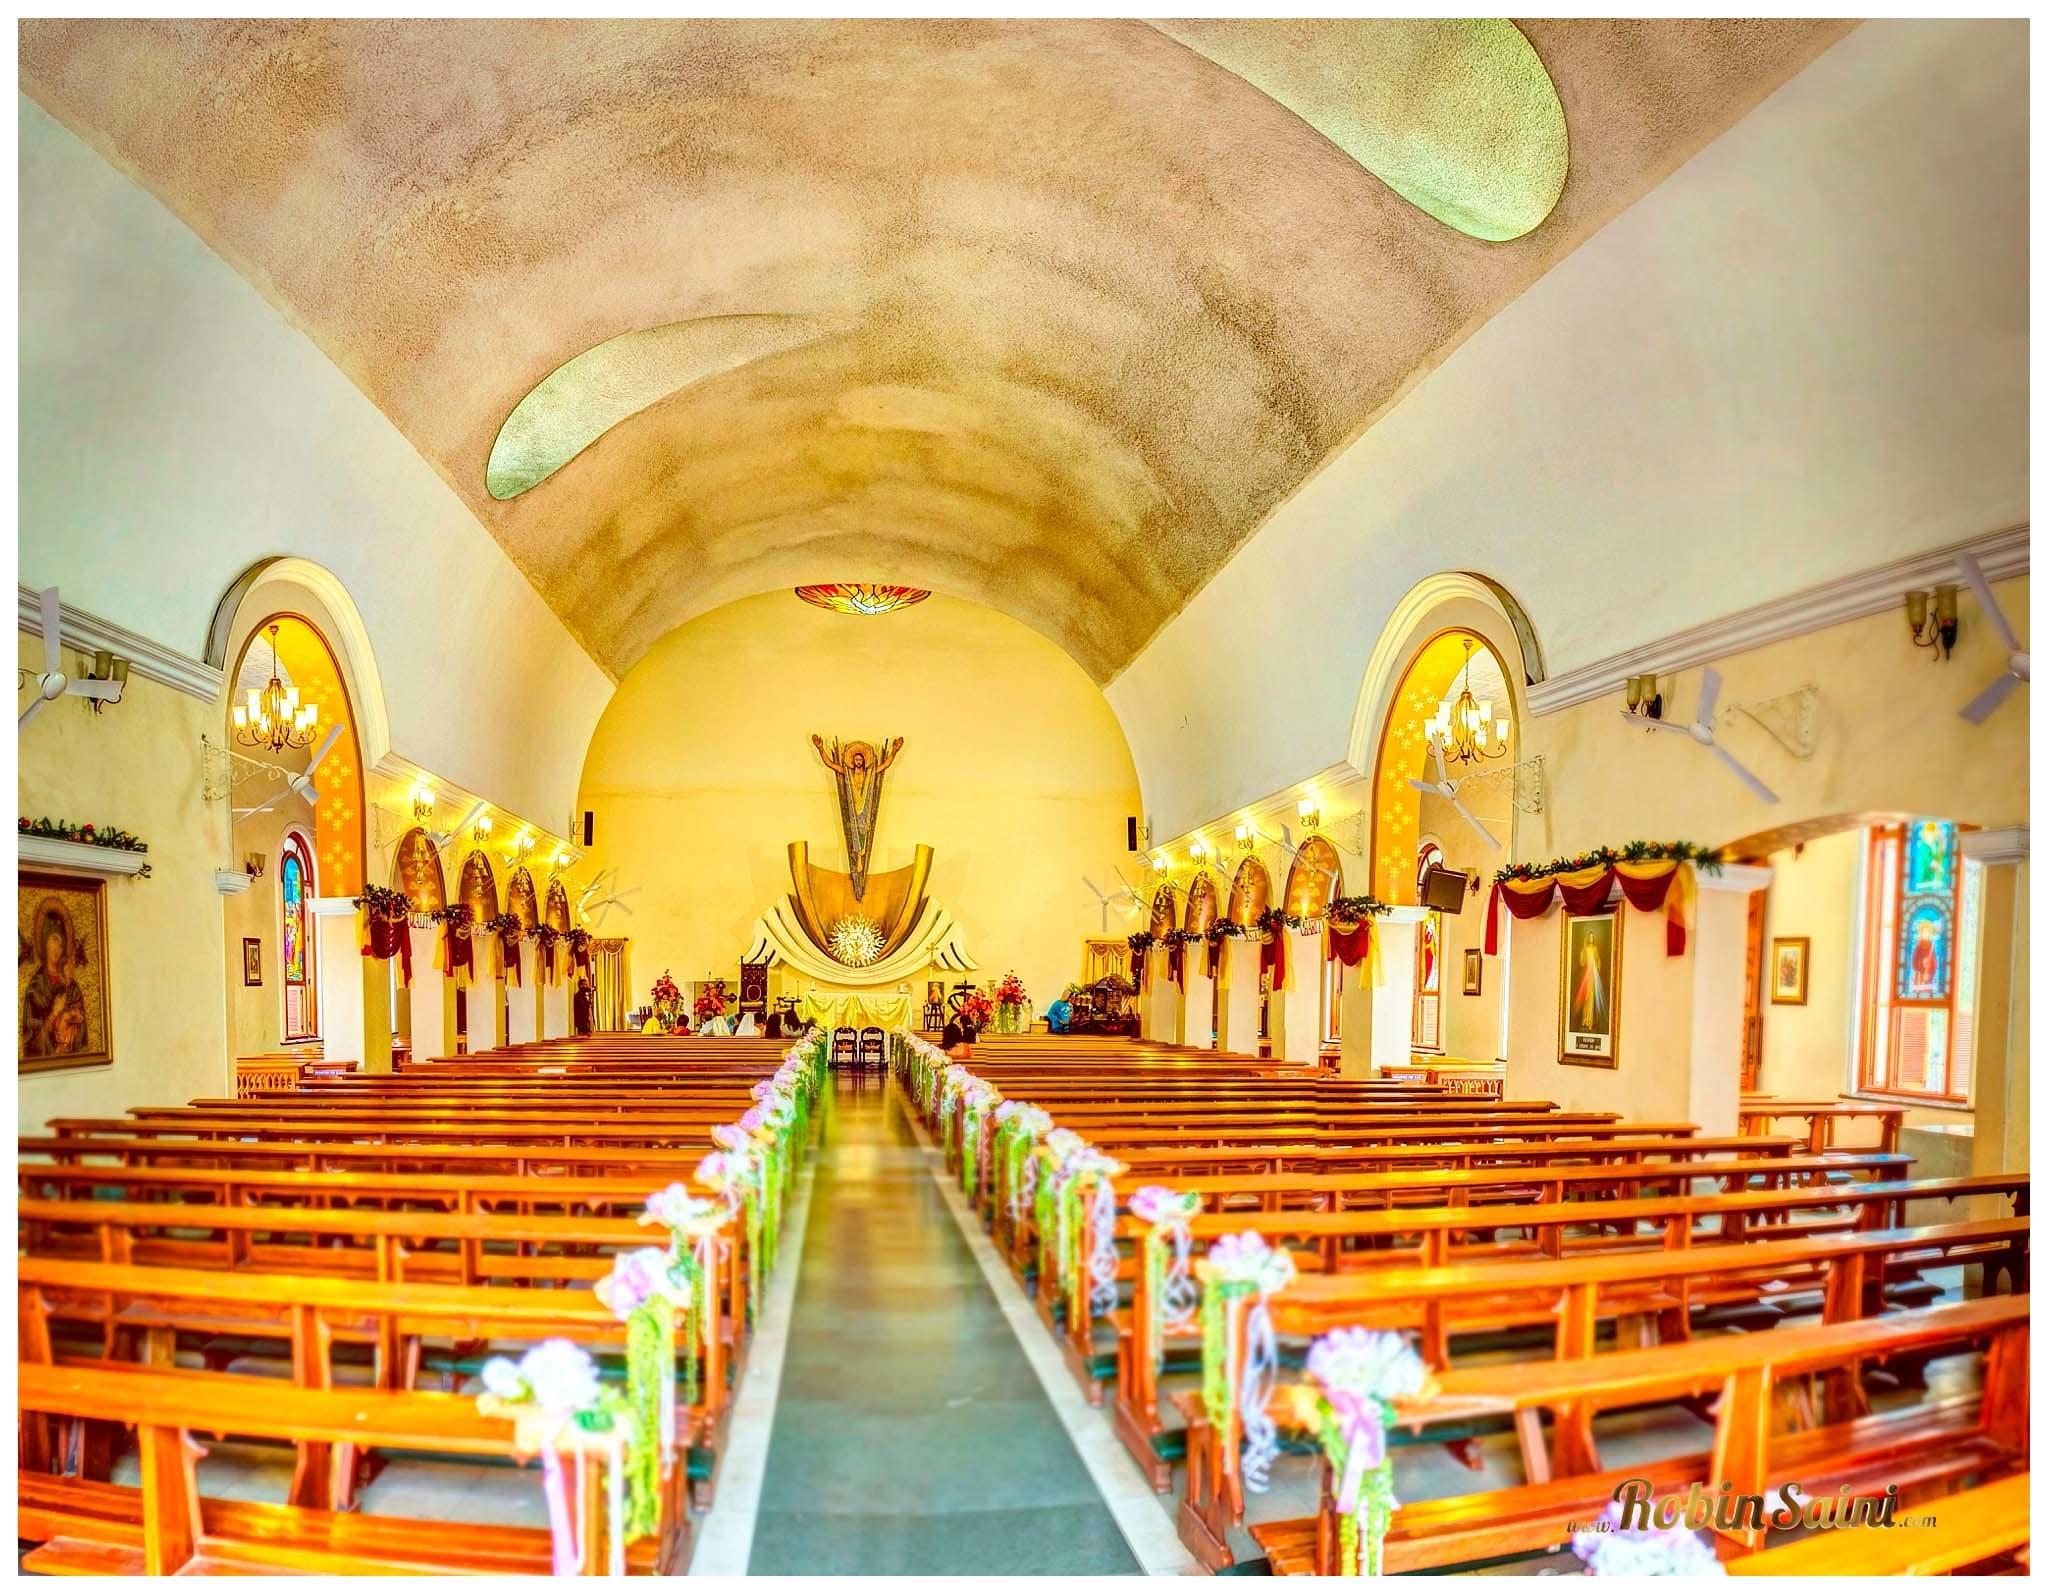 wedding venue church:robin saini photography